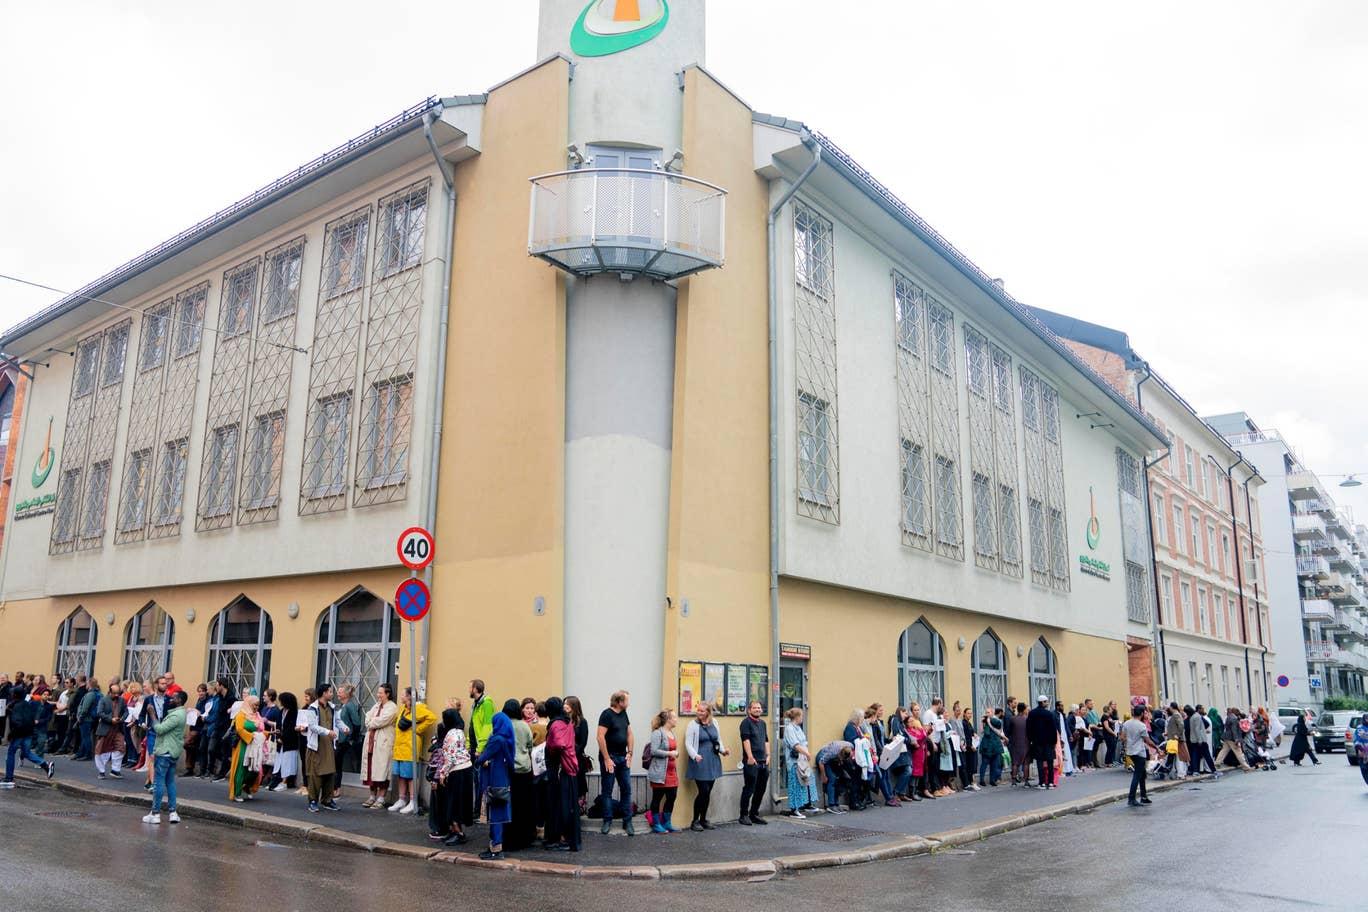 Norway-mosque-shooting-4.jpg